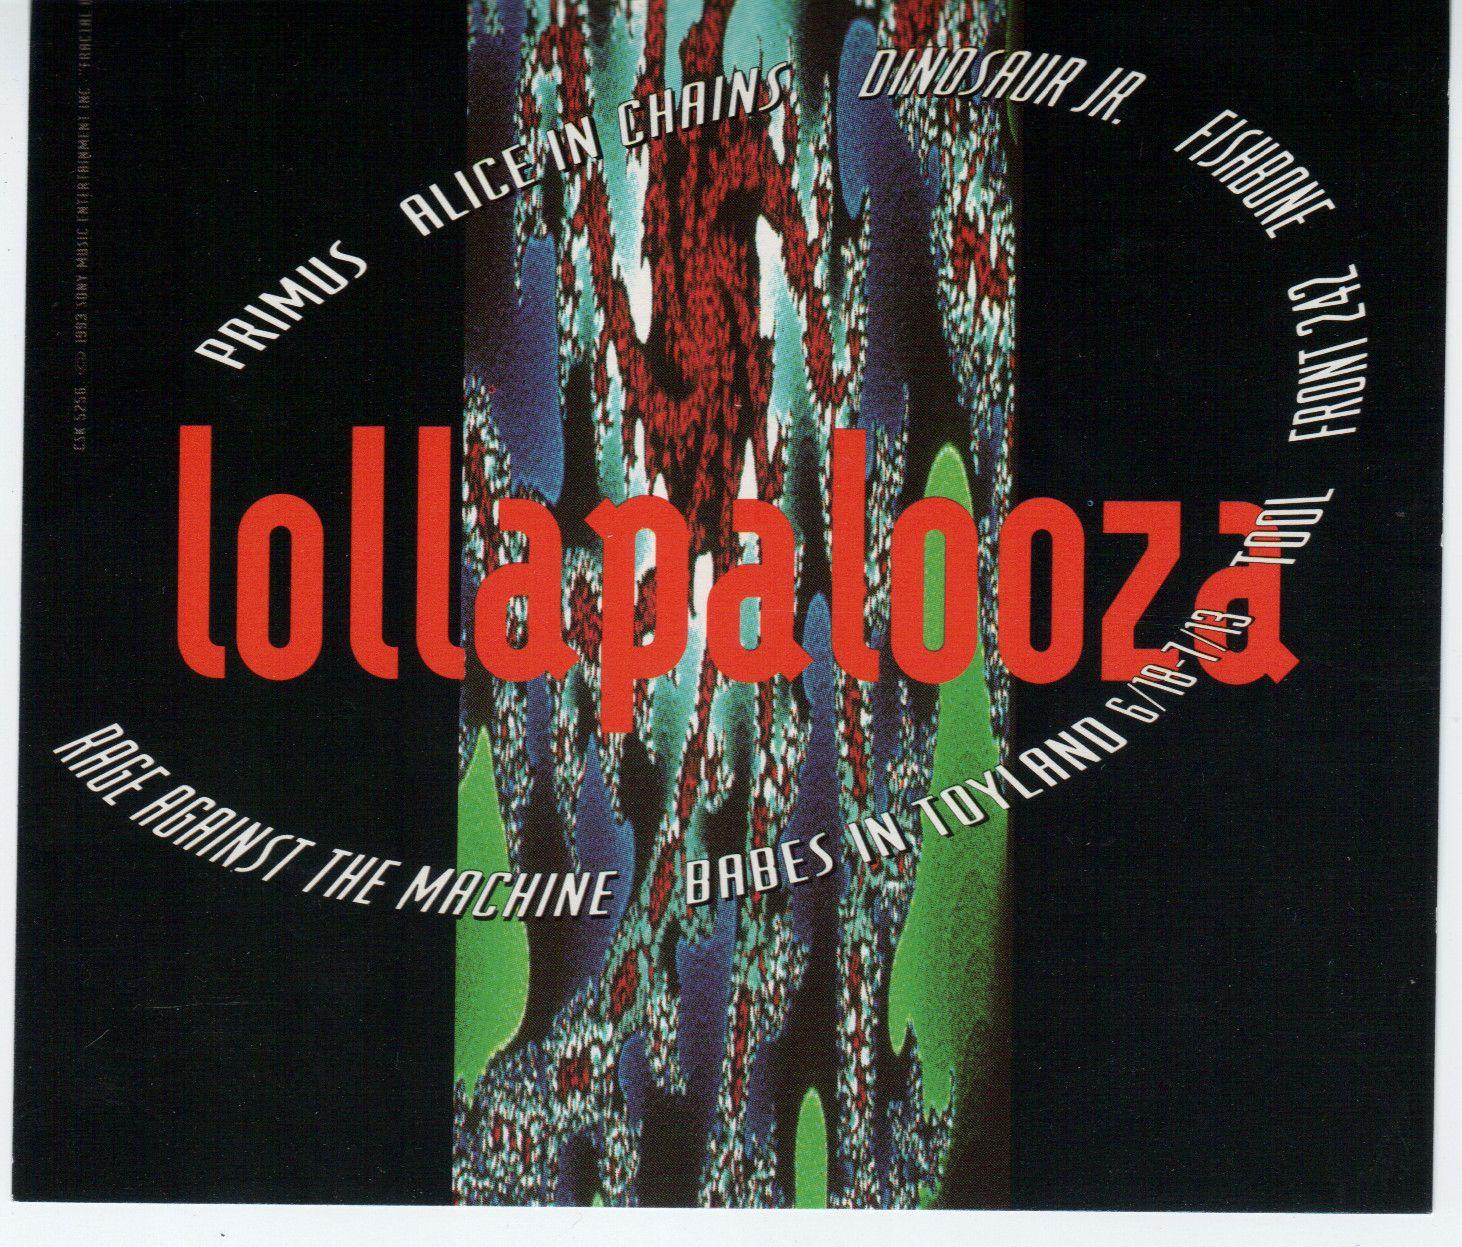 Lollapalooza 1993 tour dates in Sydney